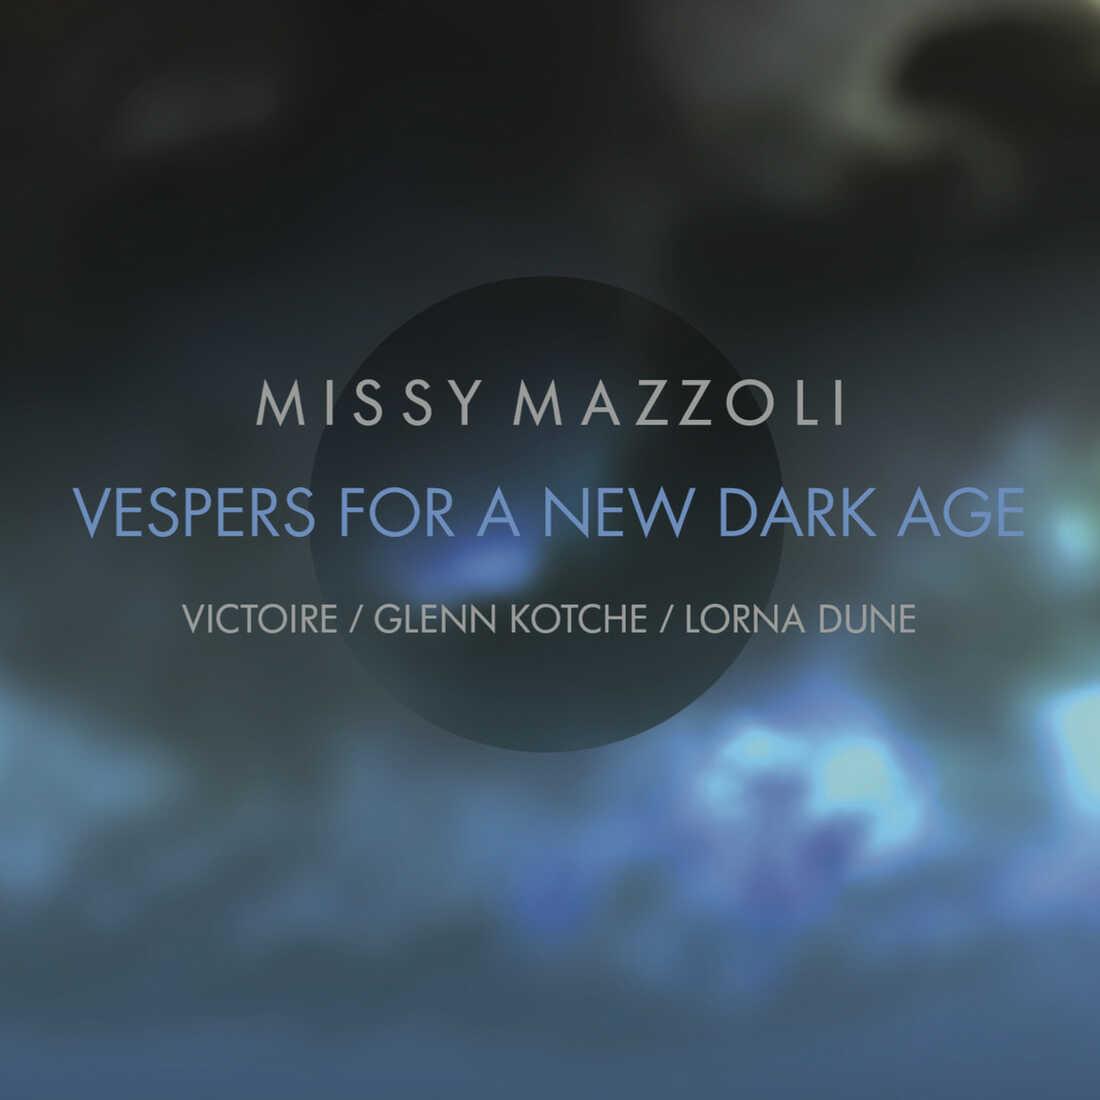 Cover art for Missy Mazzoli